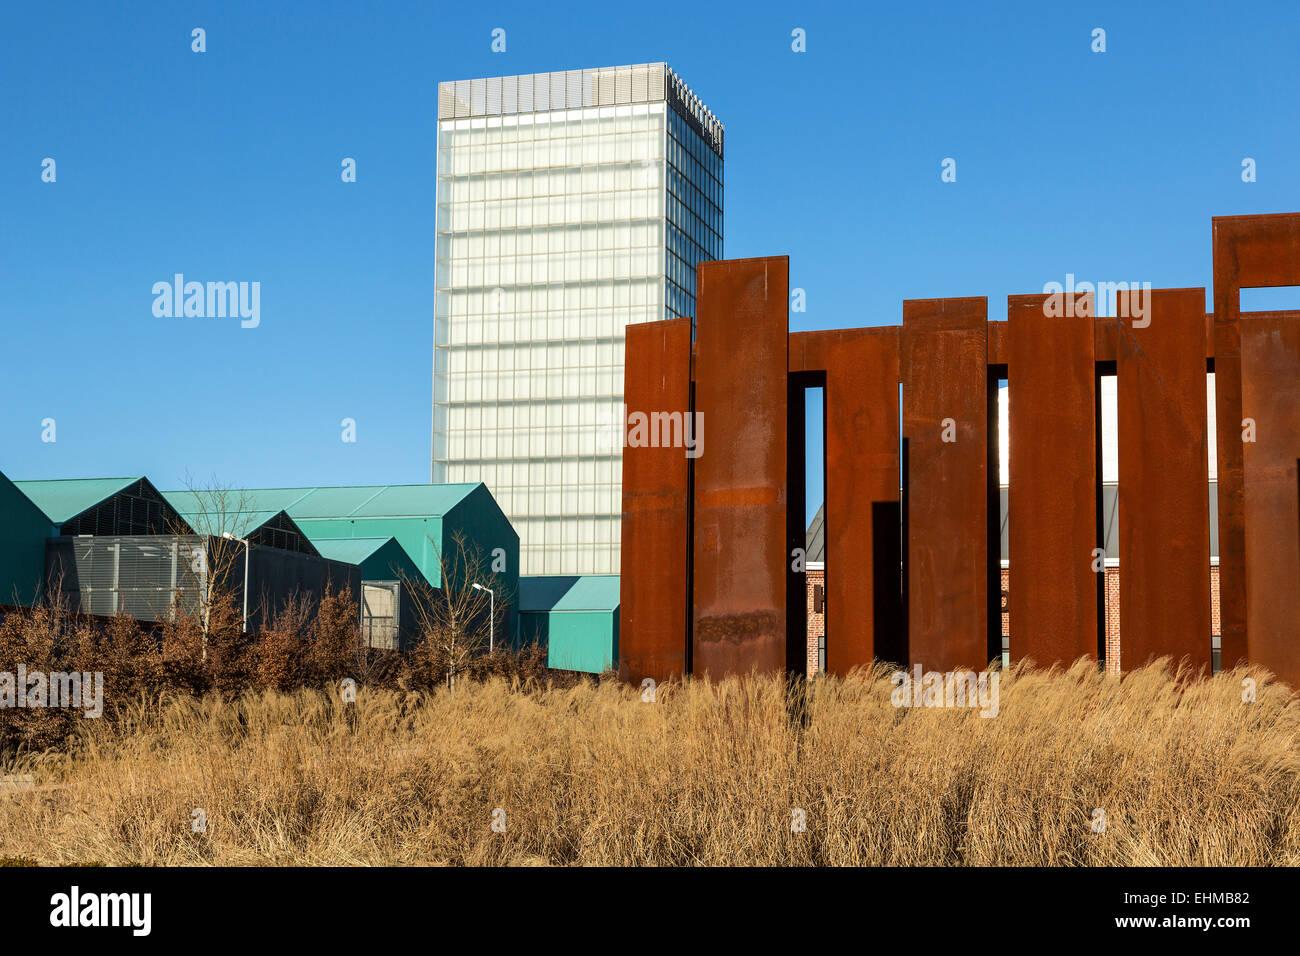 Hangar Bicocca, art, museum, architecture, industrial area, Milan Stock Photo